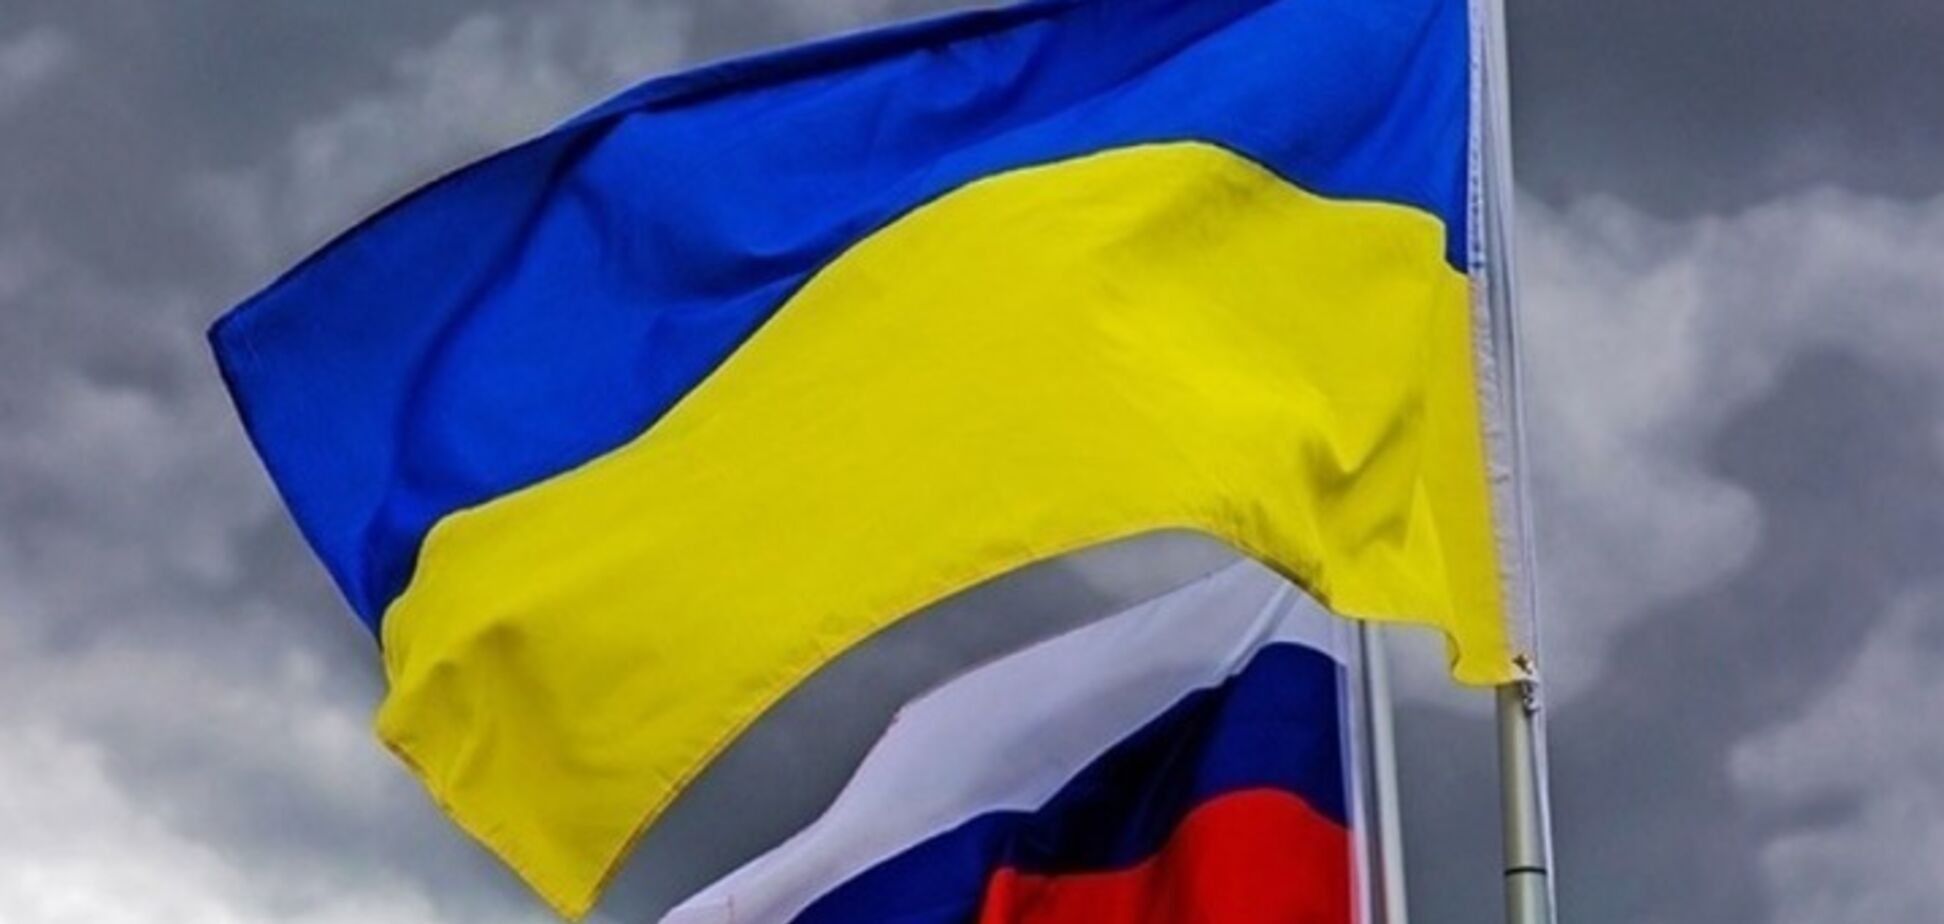 'Нам нельзя! Уберите!' Россиянки испугались украинца из-за 'Путин – х*йло!'